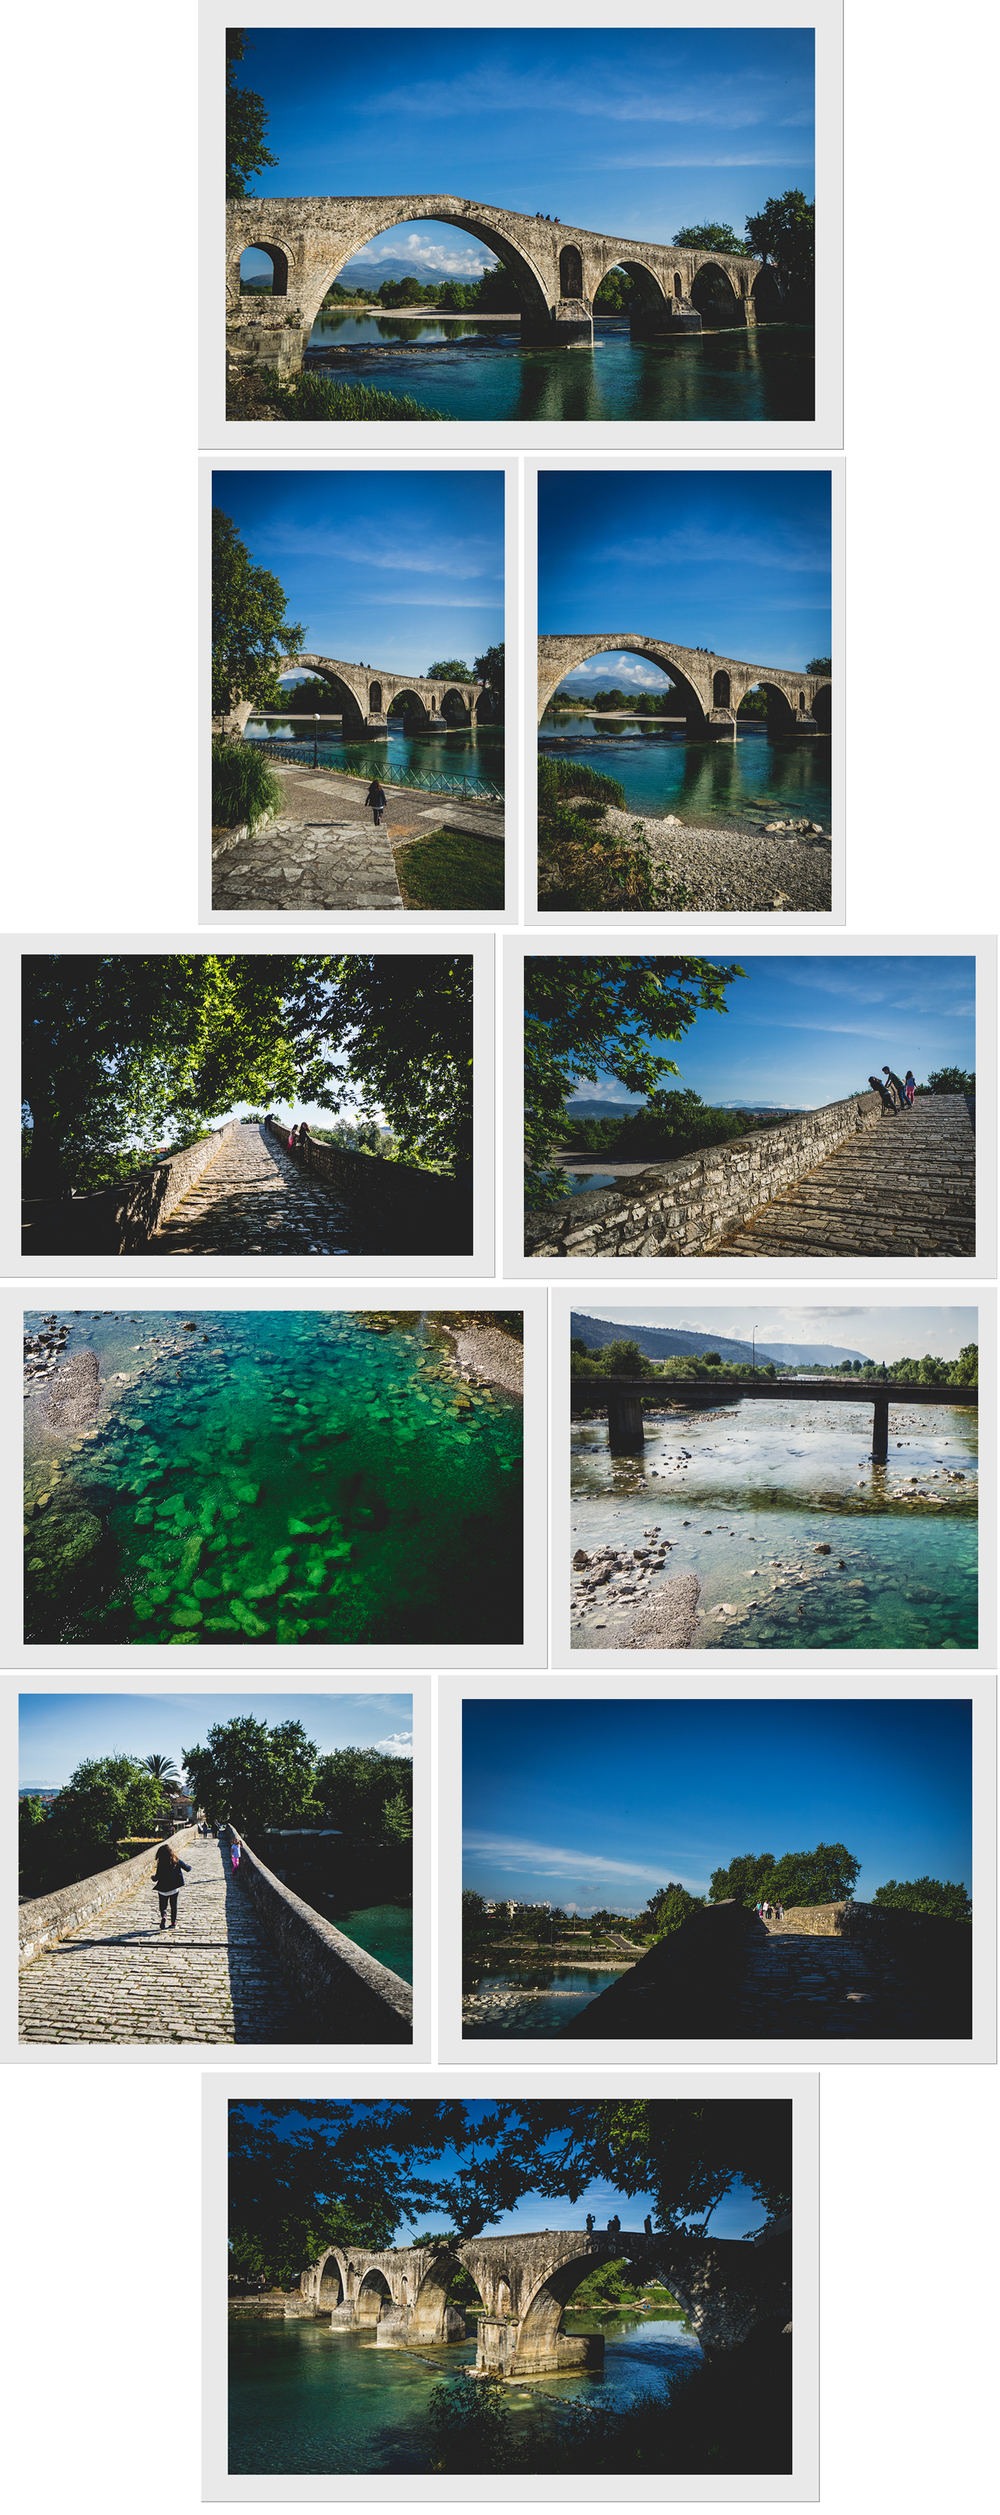 IOANNIS ANDRIOPOULOS ARTA IOANNINA PHOTOGRAPHY GREECE